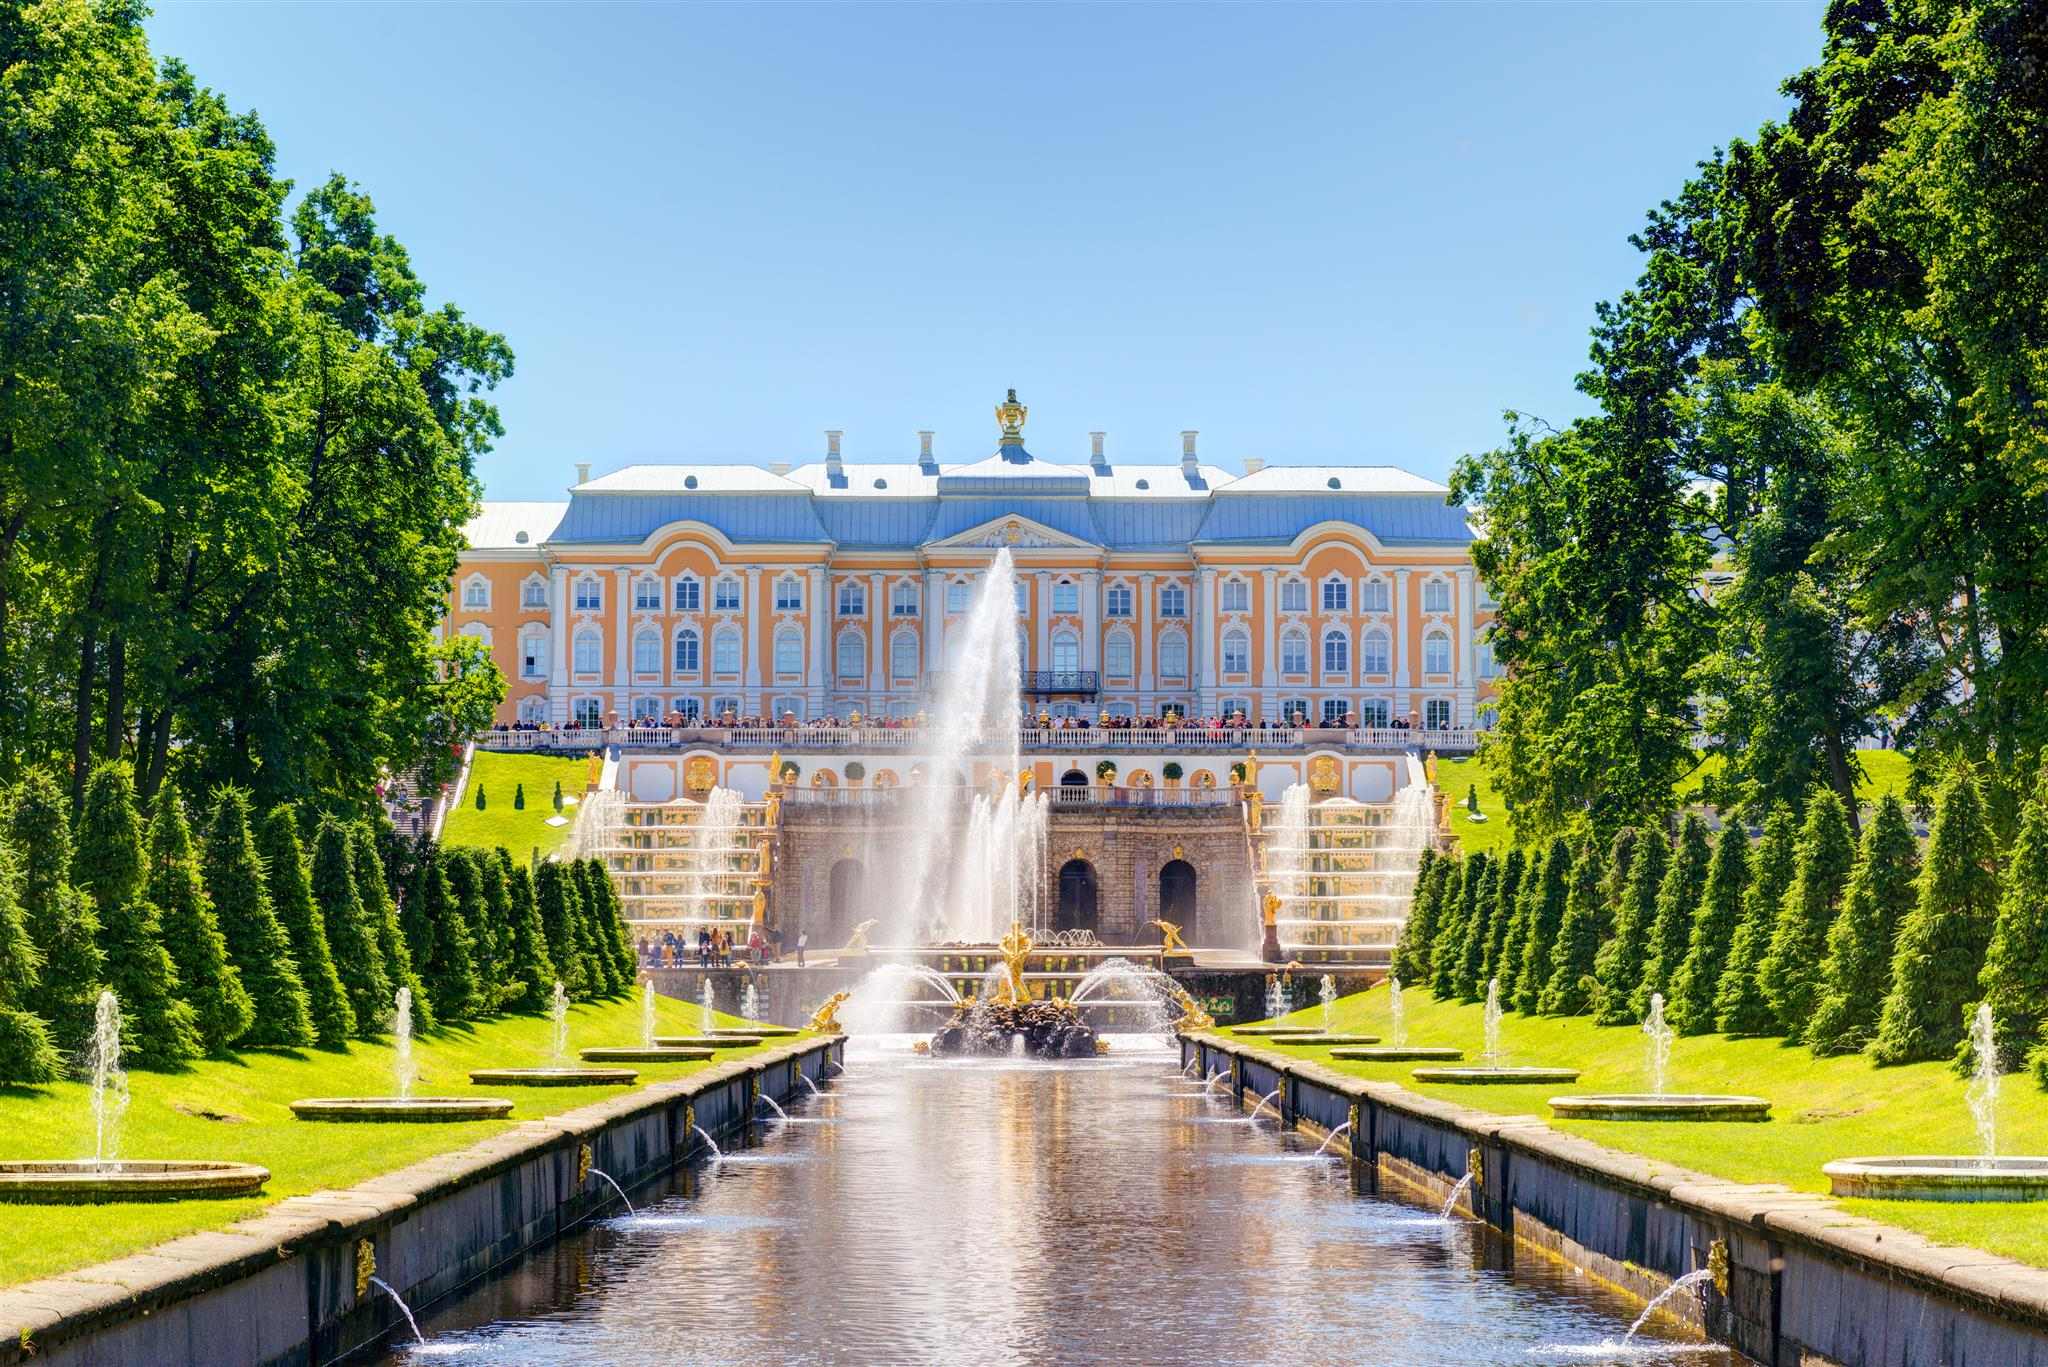 Dreamstime © - Saint-Pétersbourg - Peterhof - Jardins et fontaines (9)